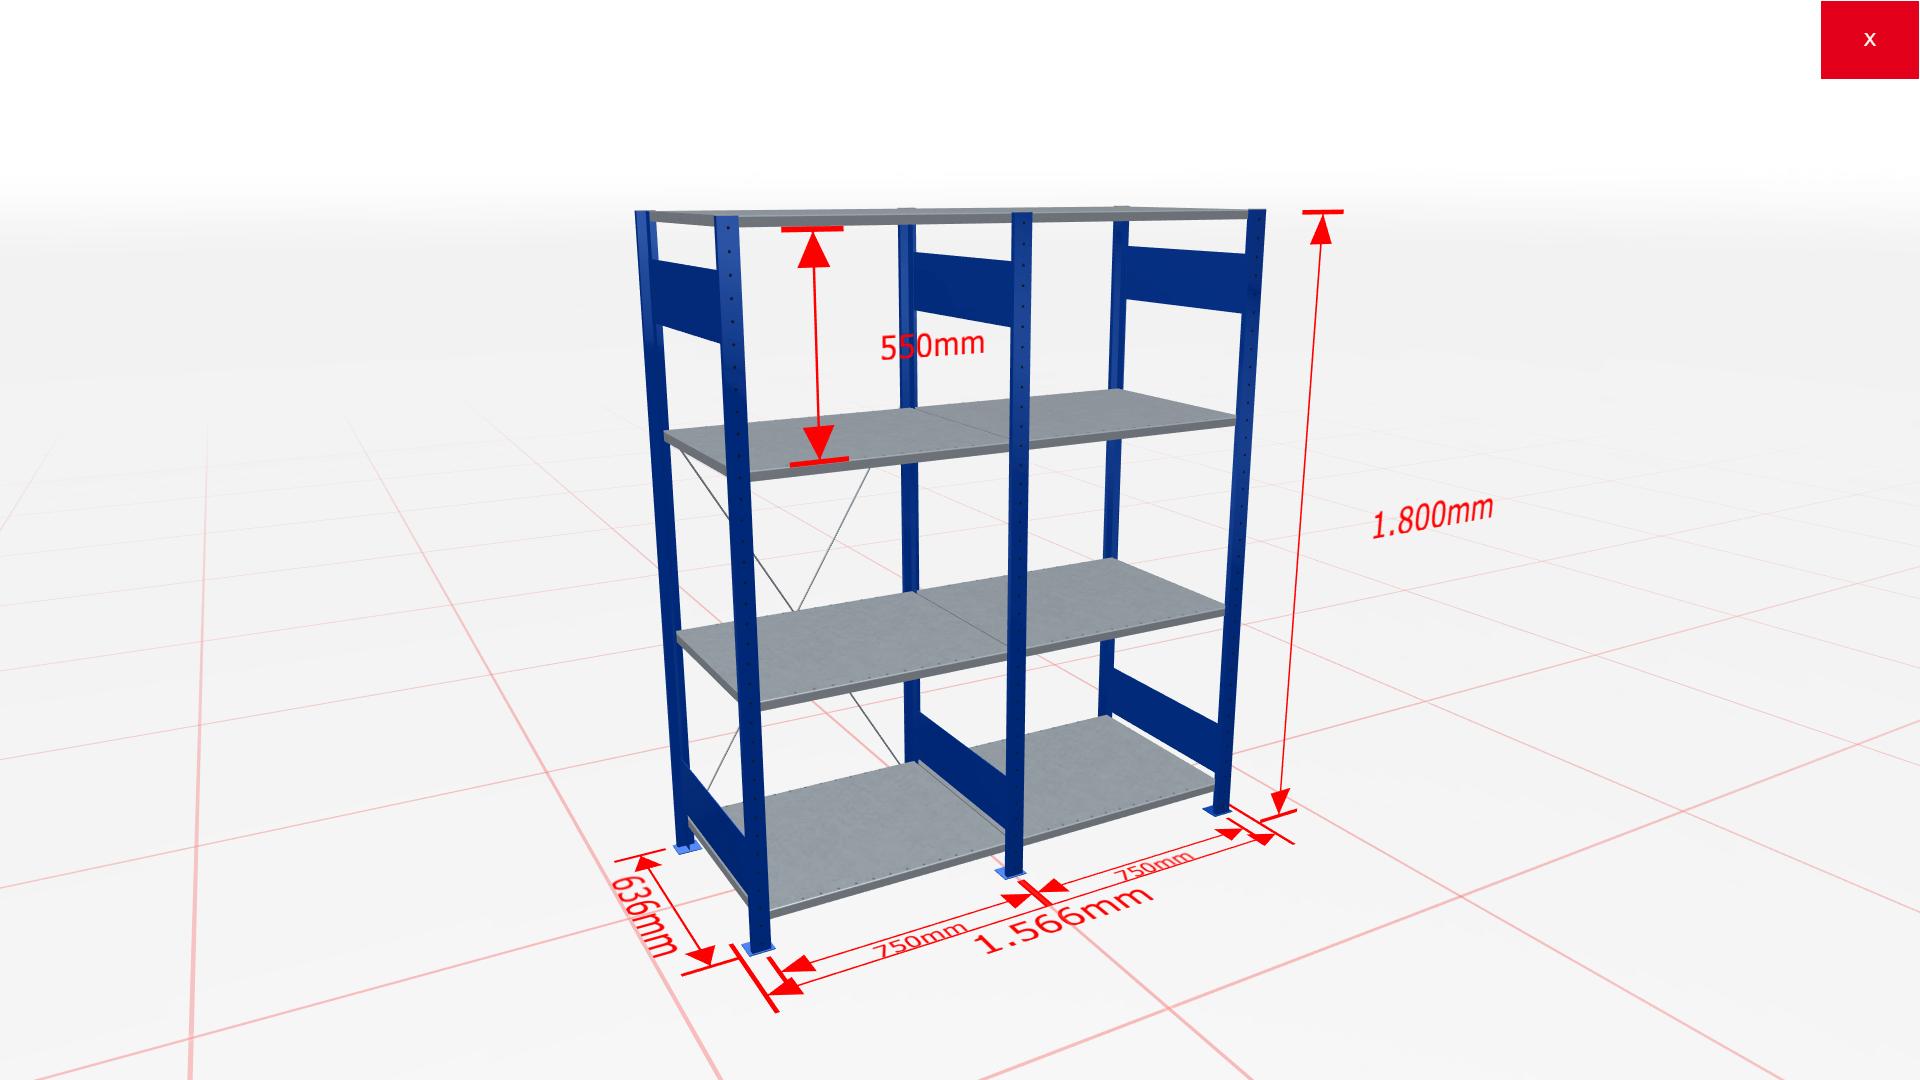 Fachbodenregal Komplettregal 1800x1566x600 mm (HxBxT) SCHULTE Lagertechnik blau 4 Ebenen  150 kg je Boden